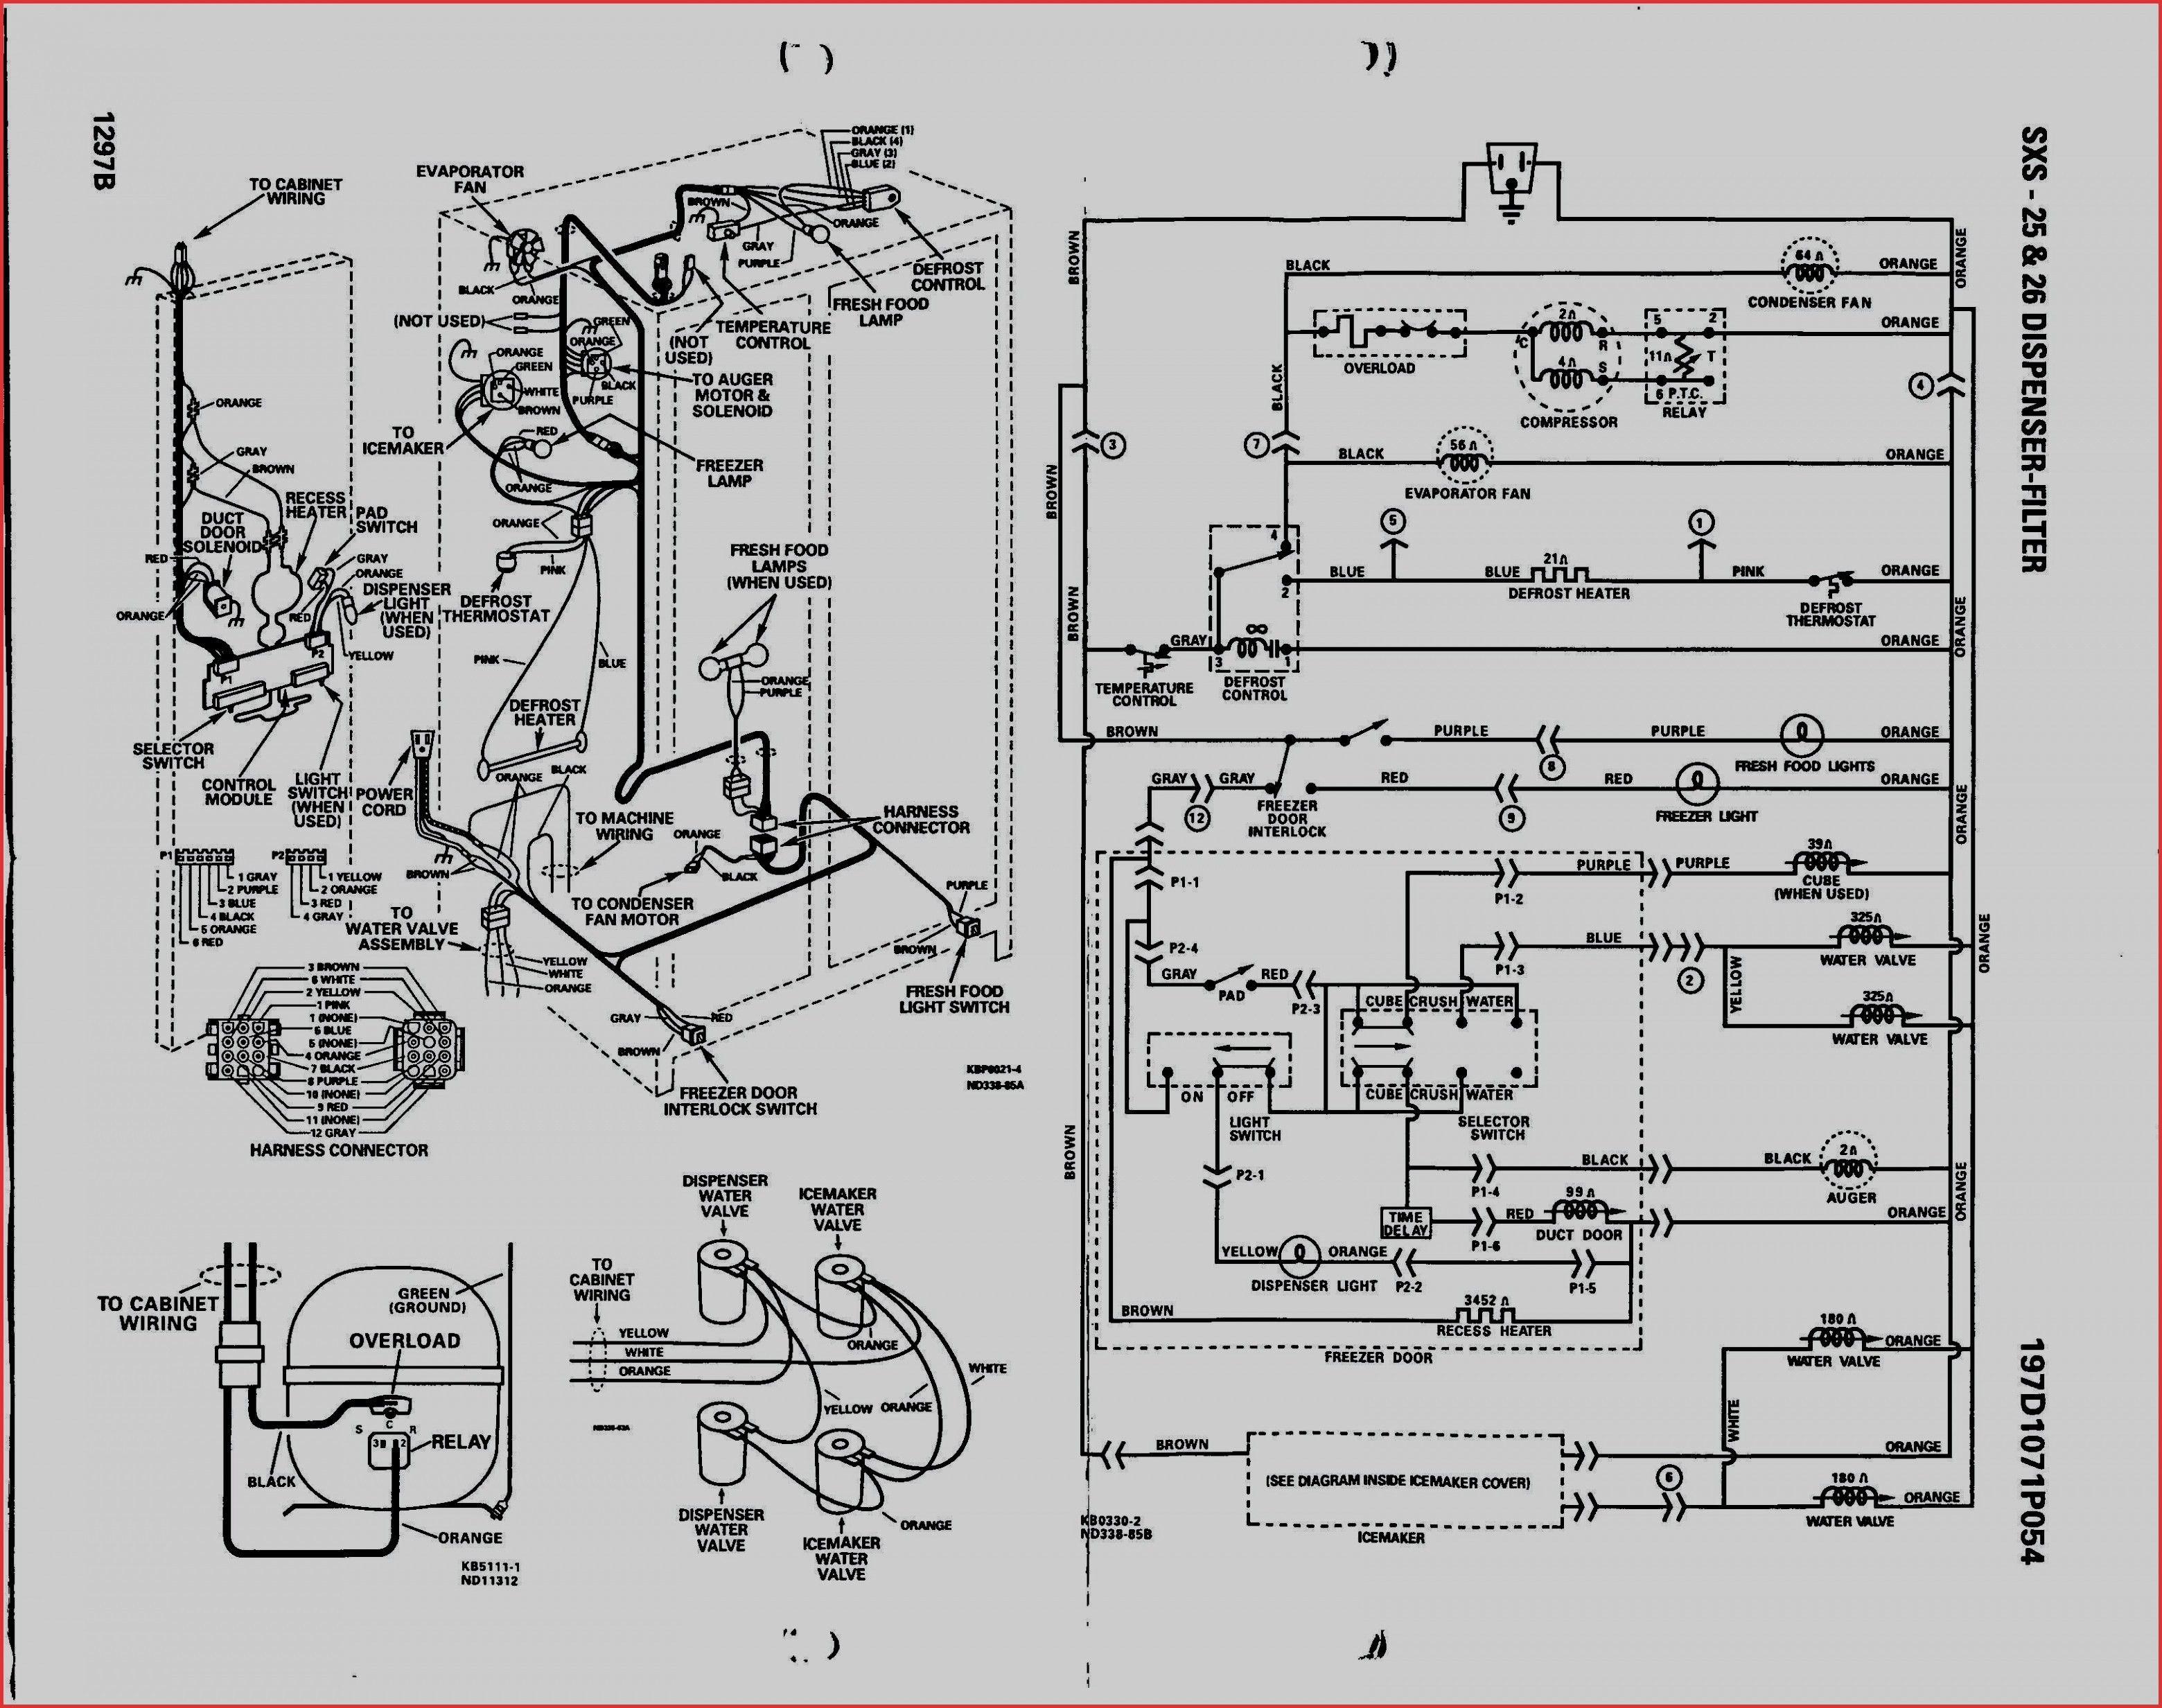 New W124 Ac Wiring Diagram House wiring, Washing machine